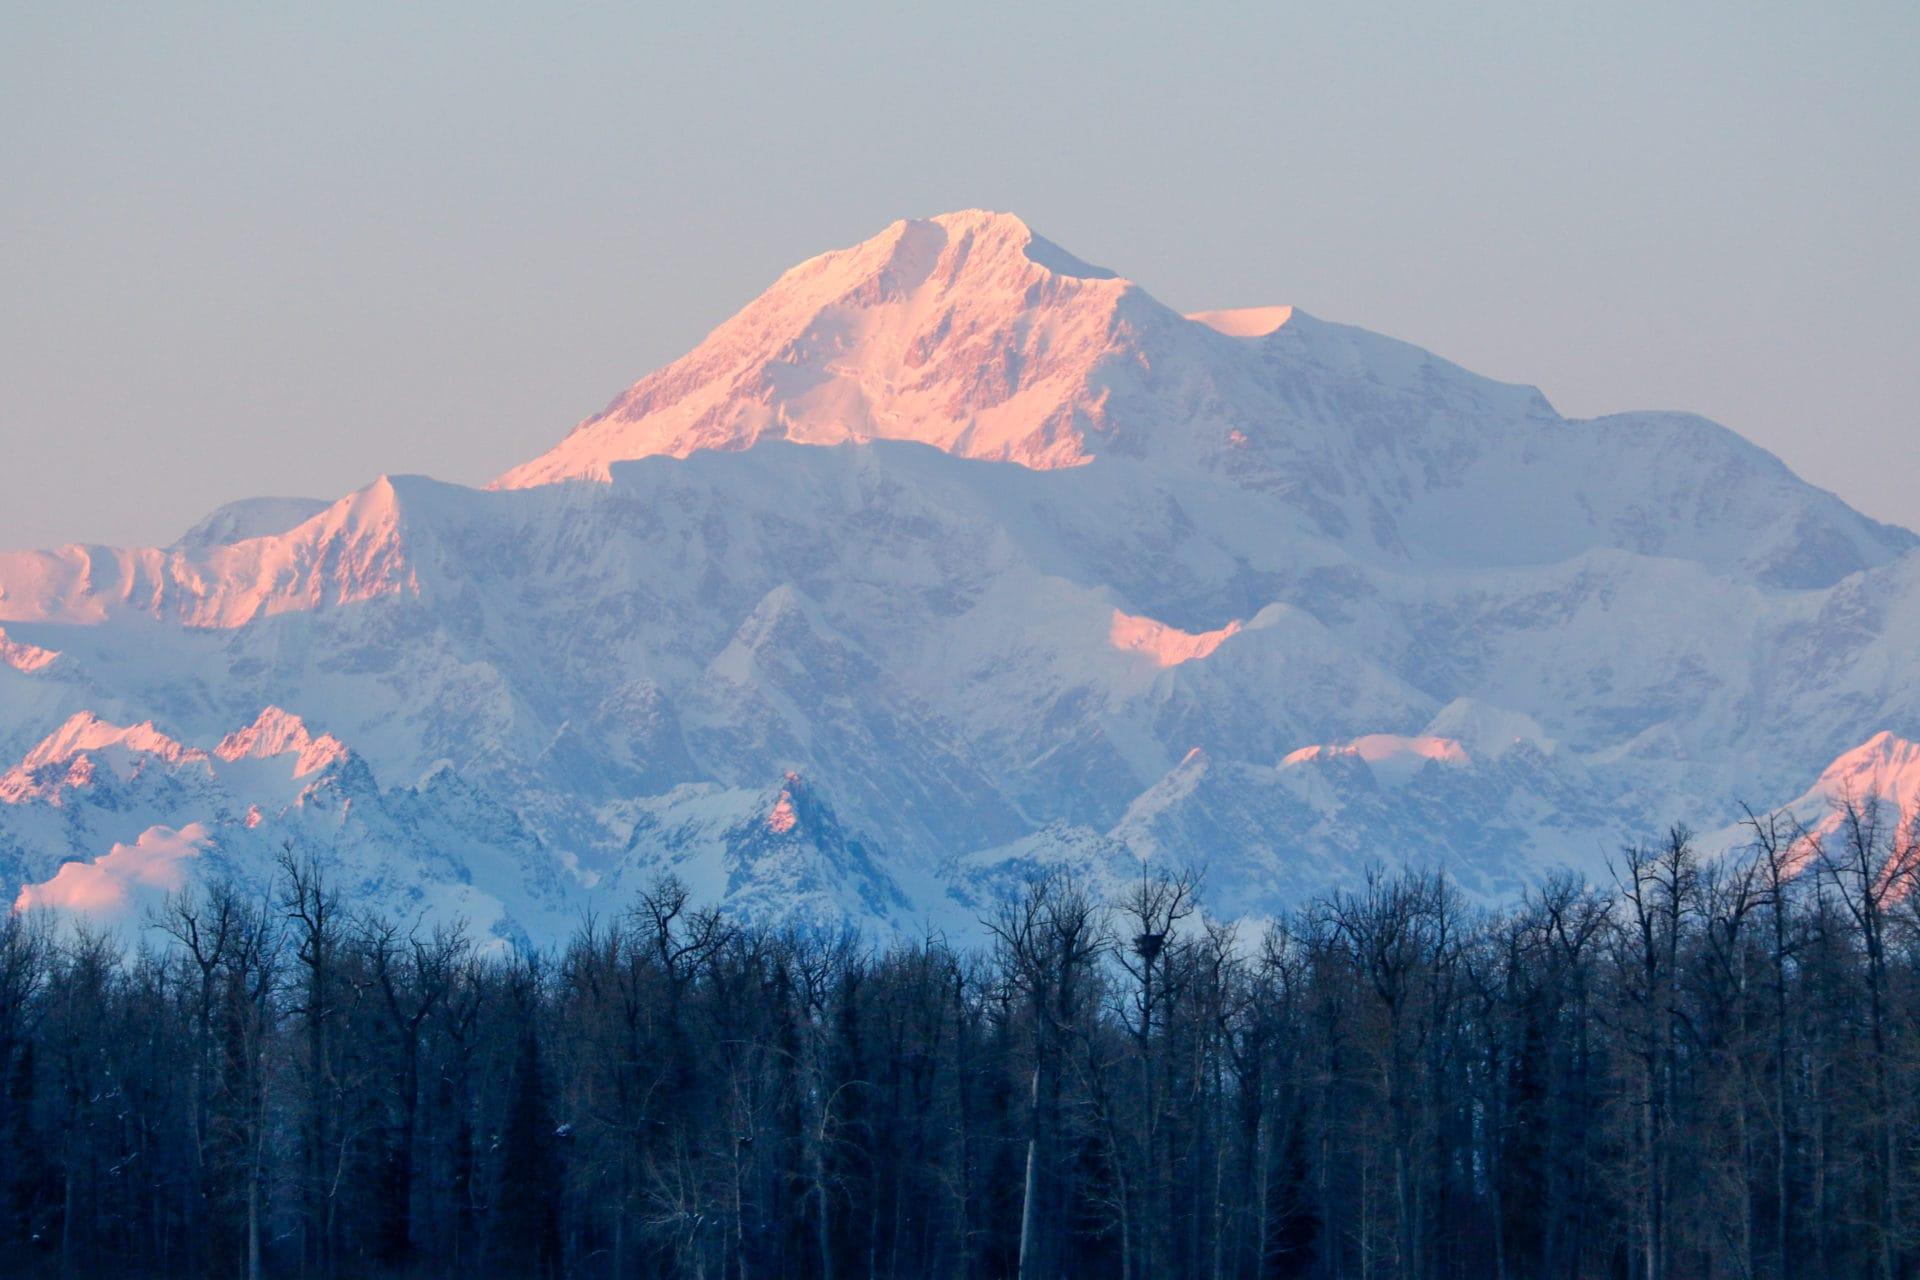 Denali is the highest mountain peak in North America.